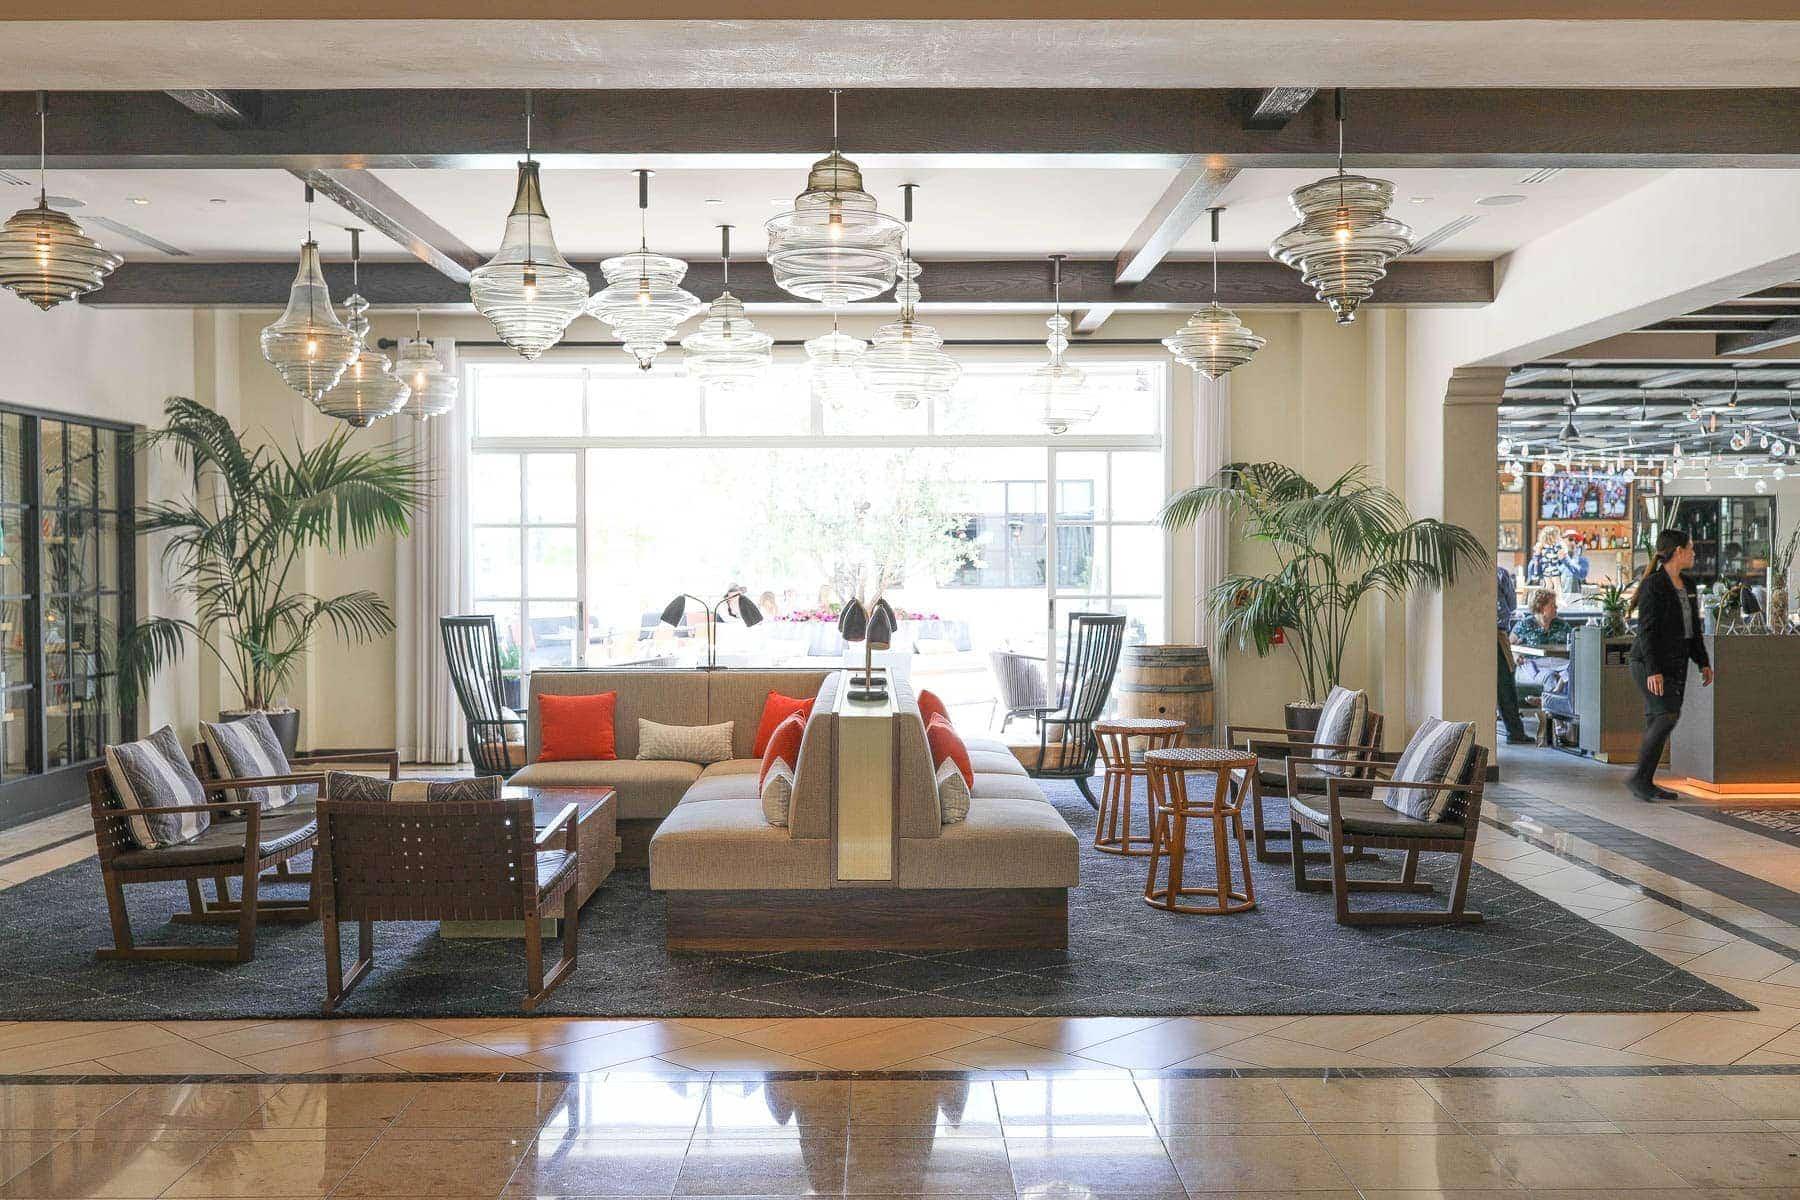 Hotel Interior Design #familytravelsandiego #sandiego #fourseasonsresidenceclub #bigfamilytravel